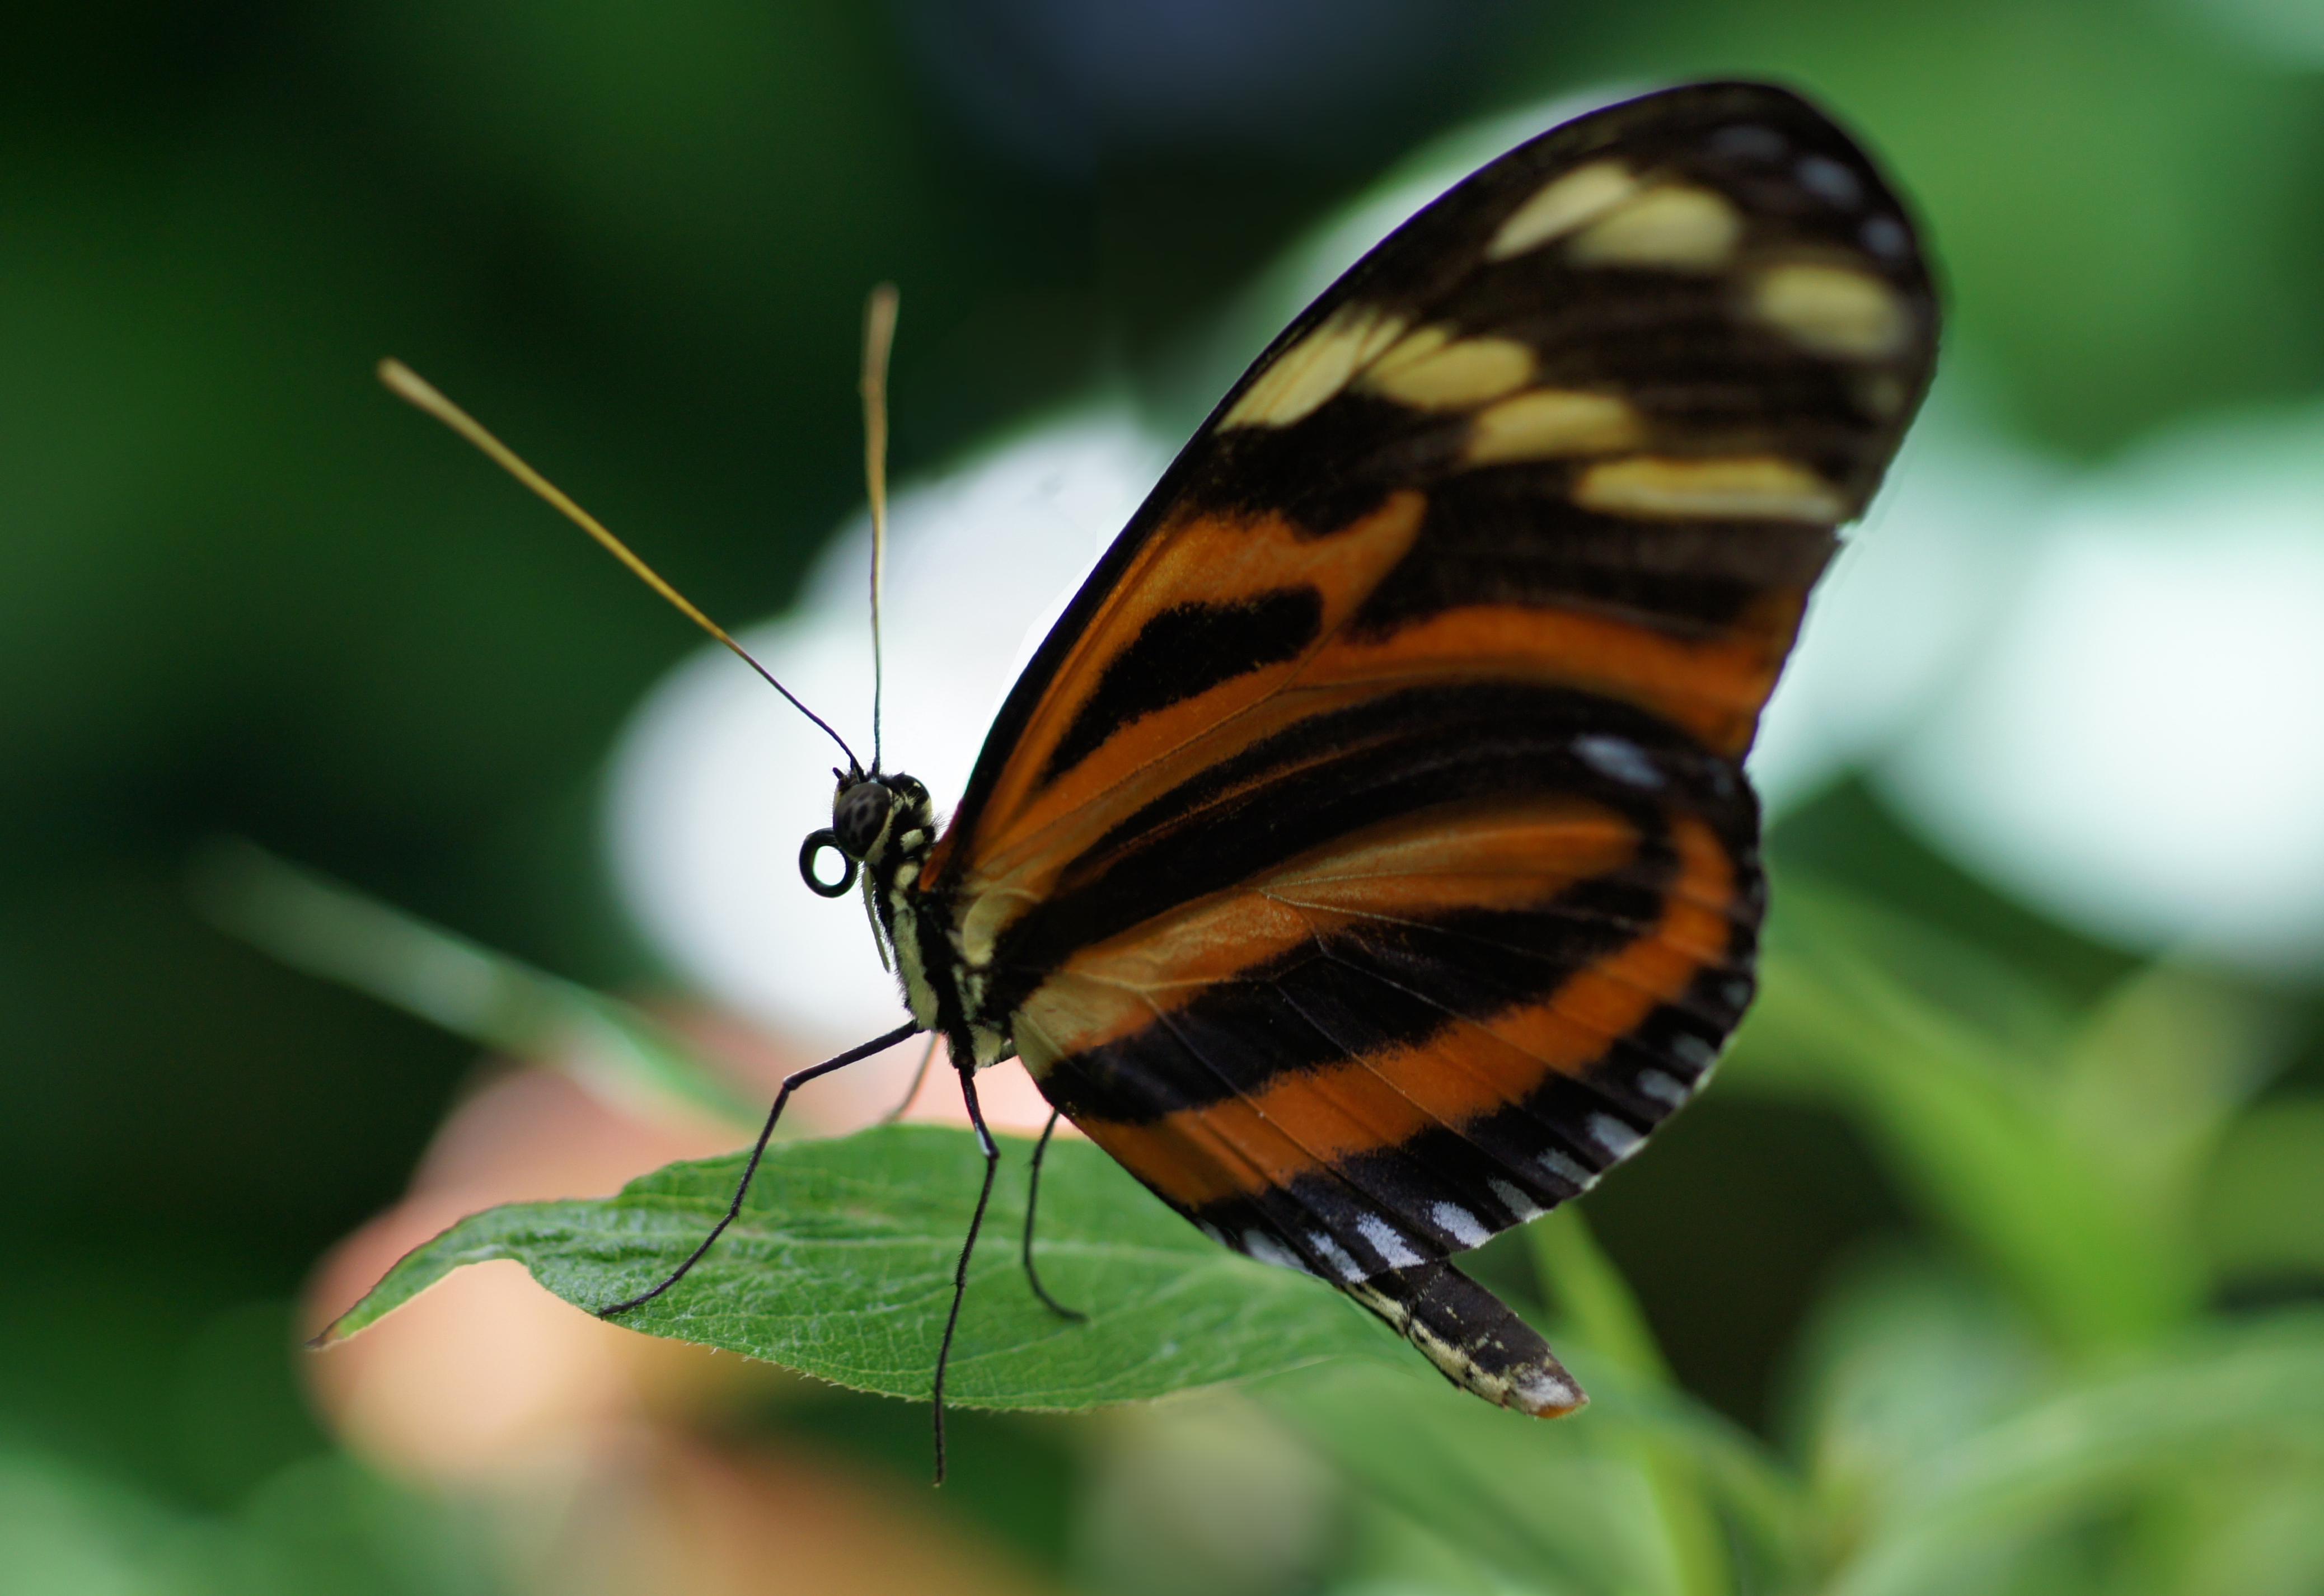 Heliconius Butterflies, Heliconius Butterflies Pictures